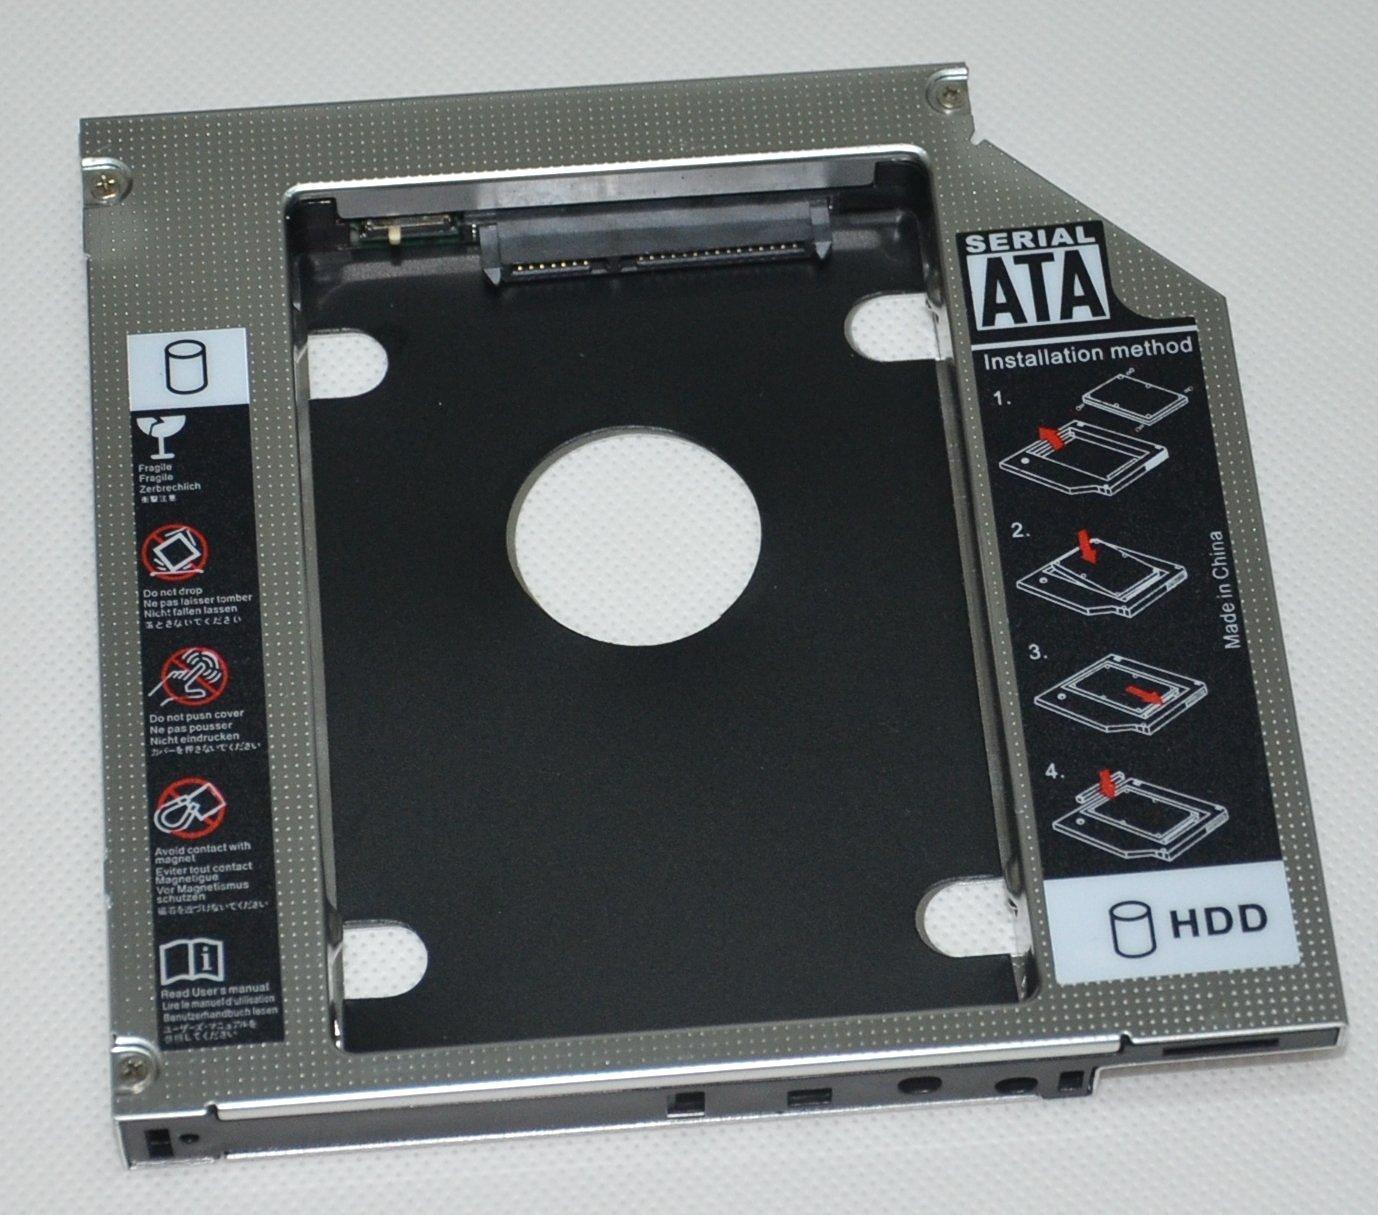 SATA DV5-1004NR Laptops Hard Drive Upgrade for Compaq HP Pavilion DV5-1002nr 500GB Serial ATA